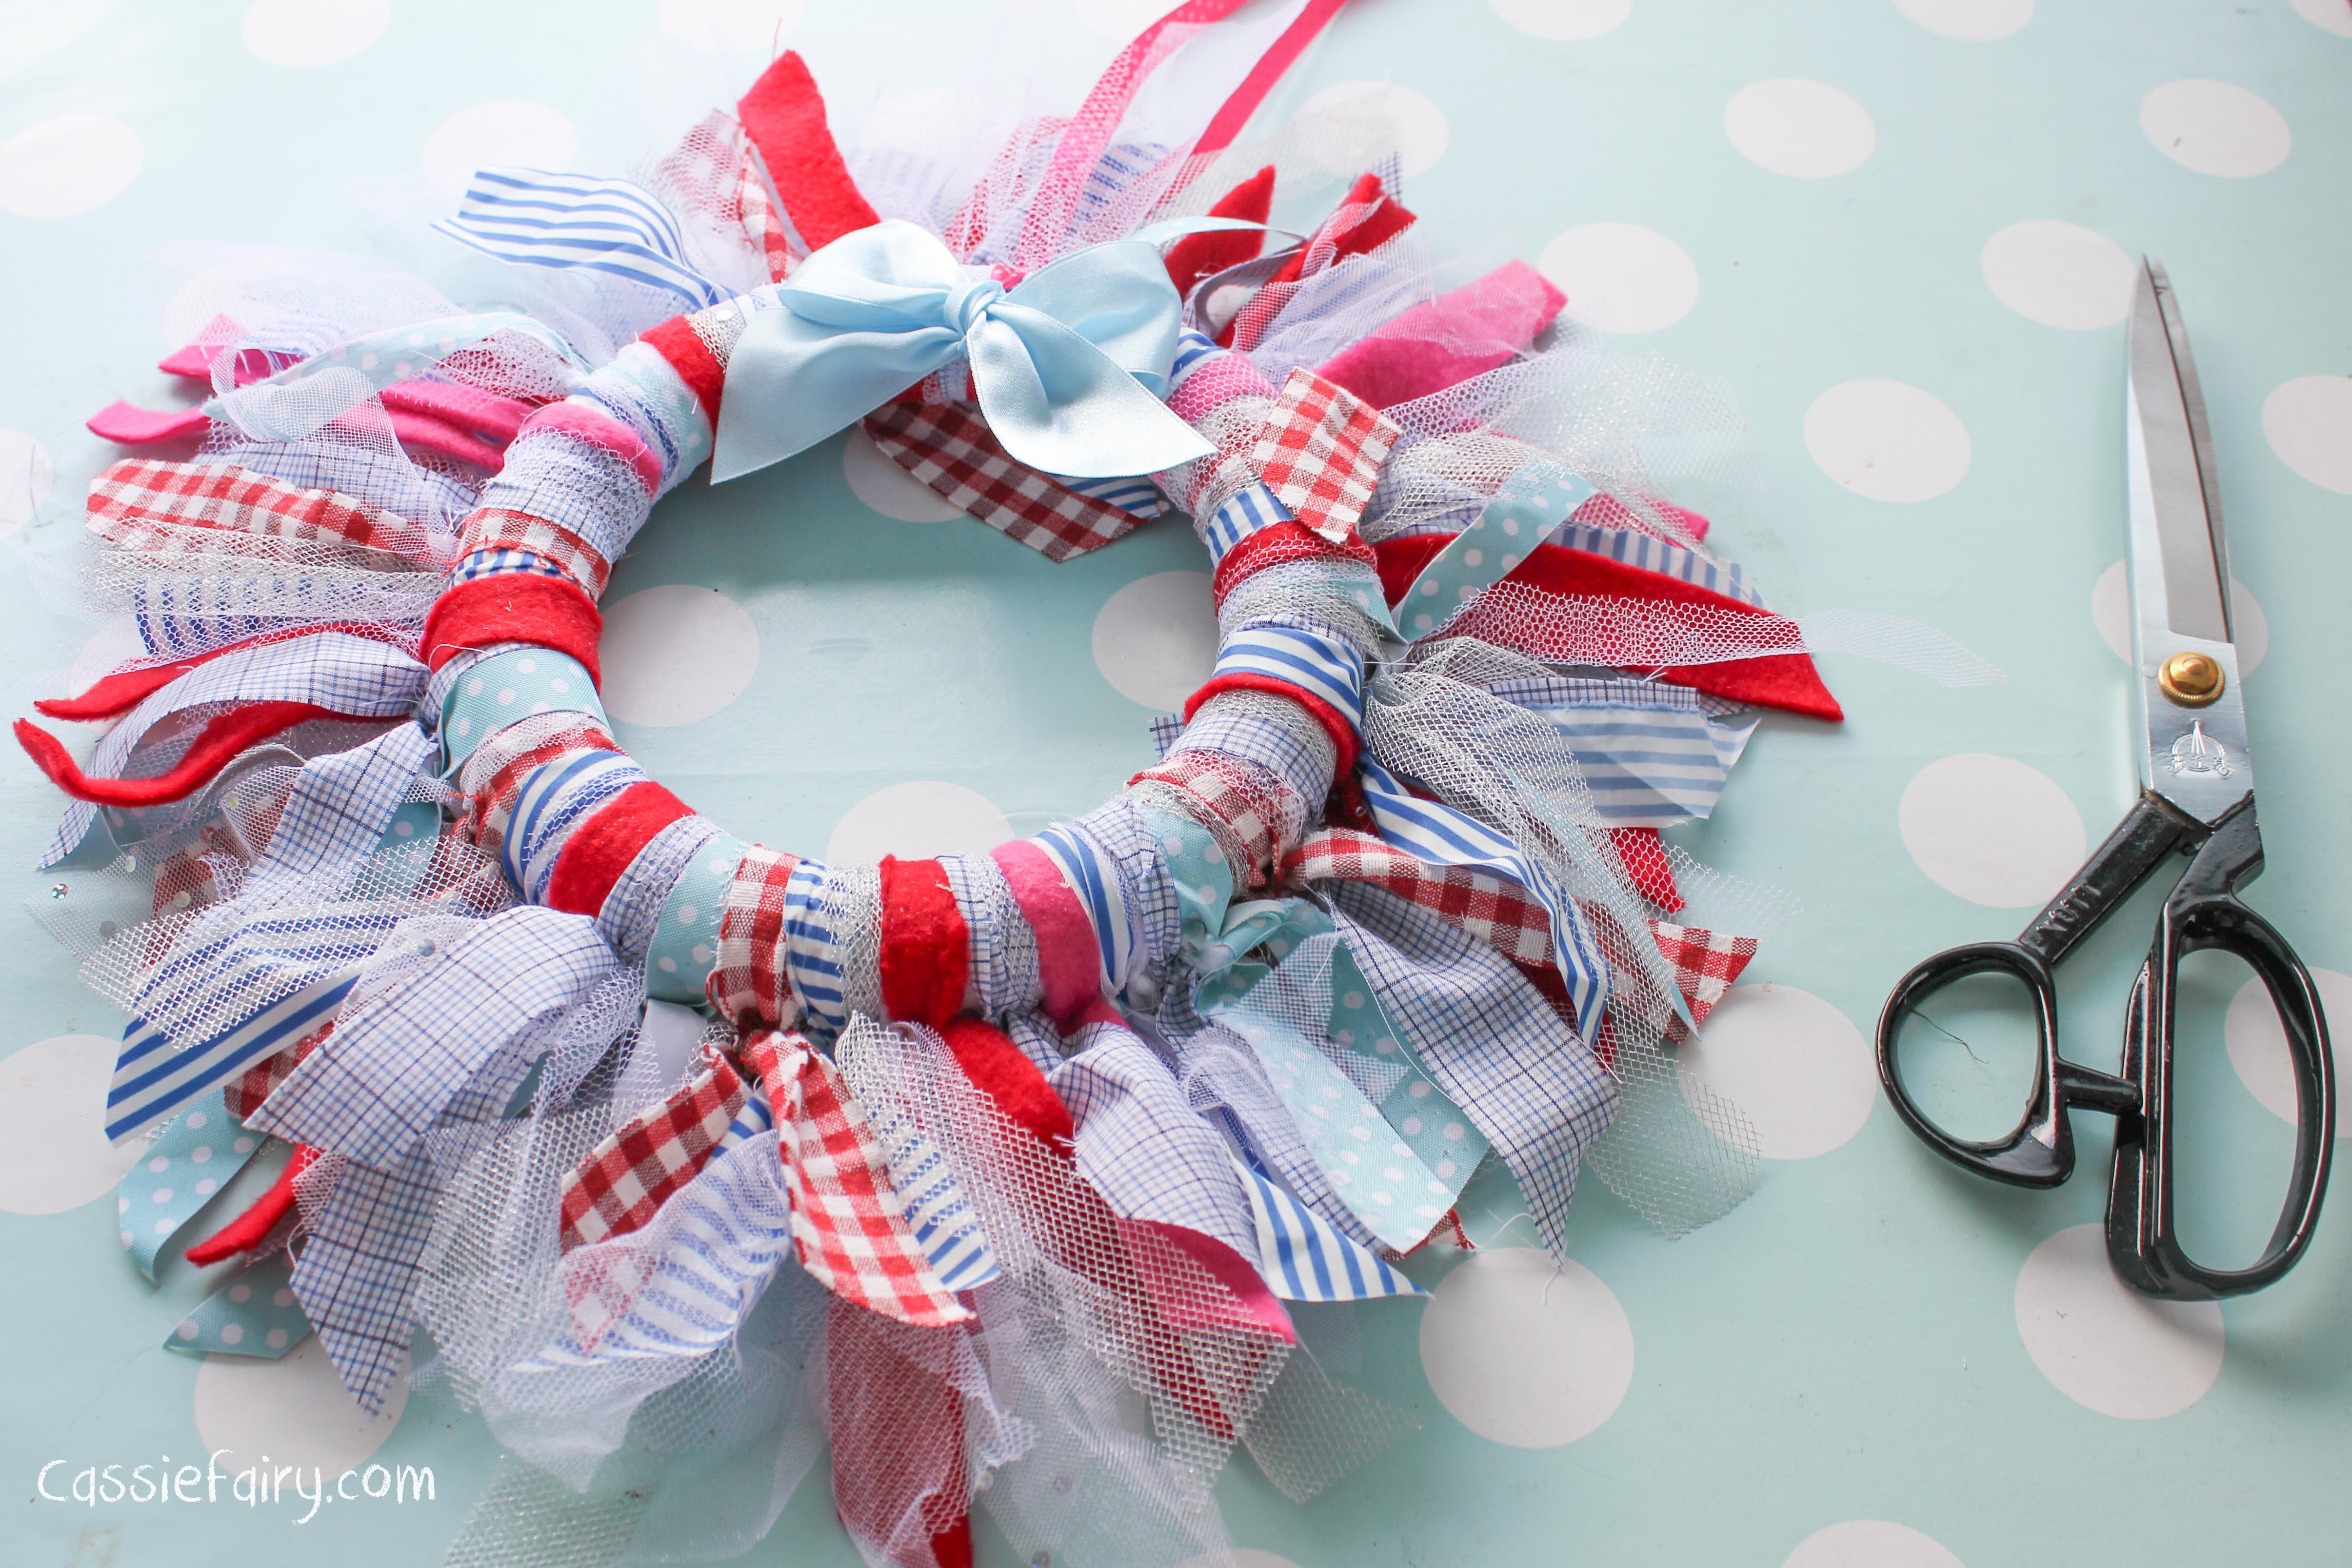 DIY fabric wreath & my favourite decorations